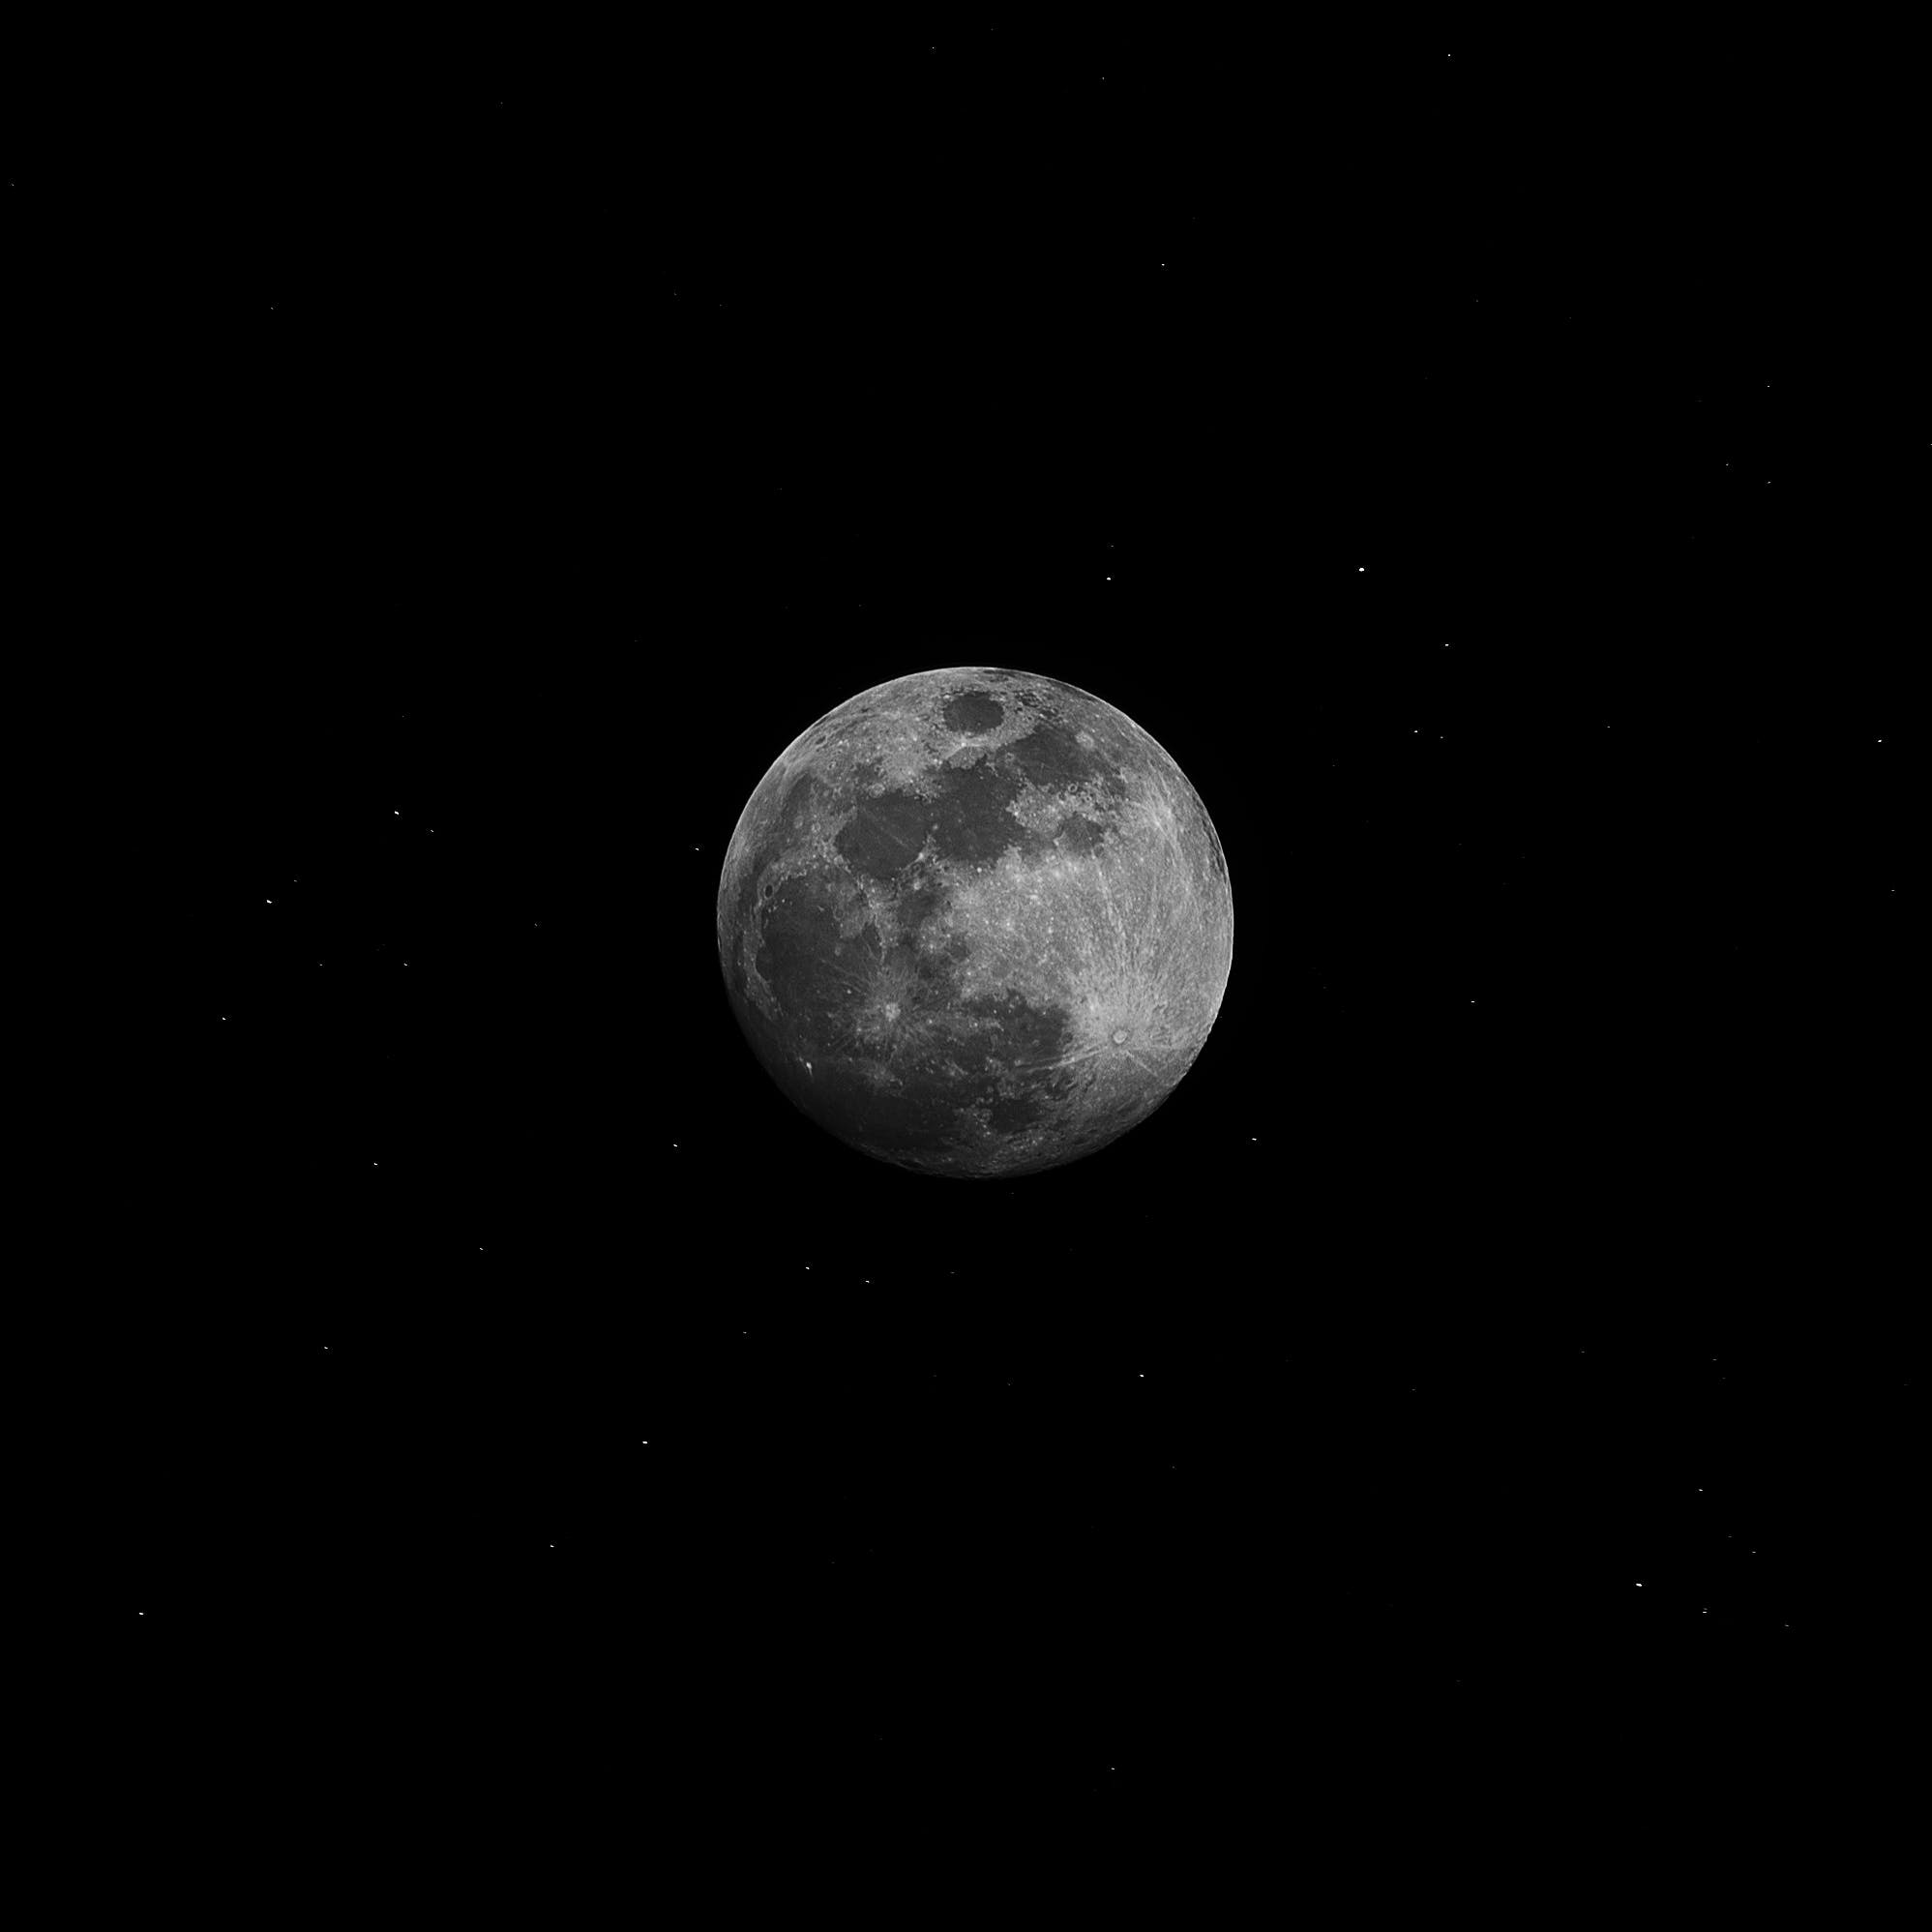 Gratis arkivbilde med astrologi, astronomi, fullmåne, krater